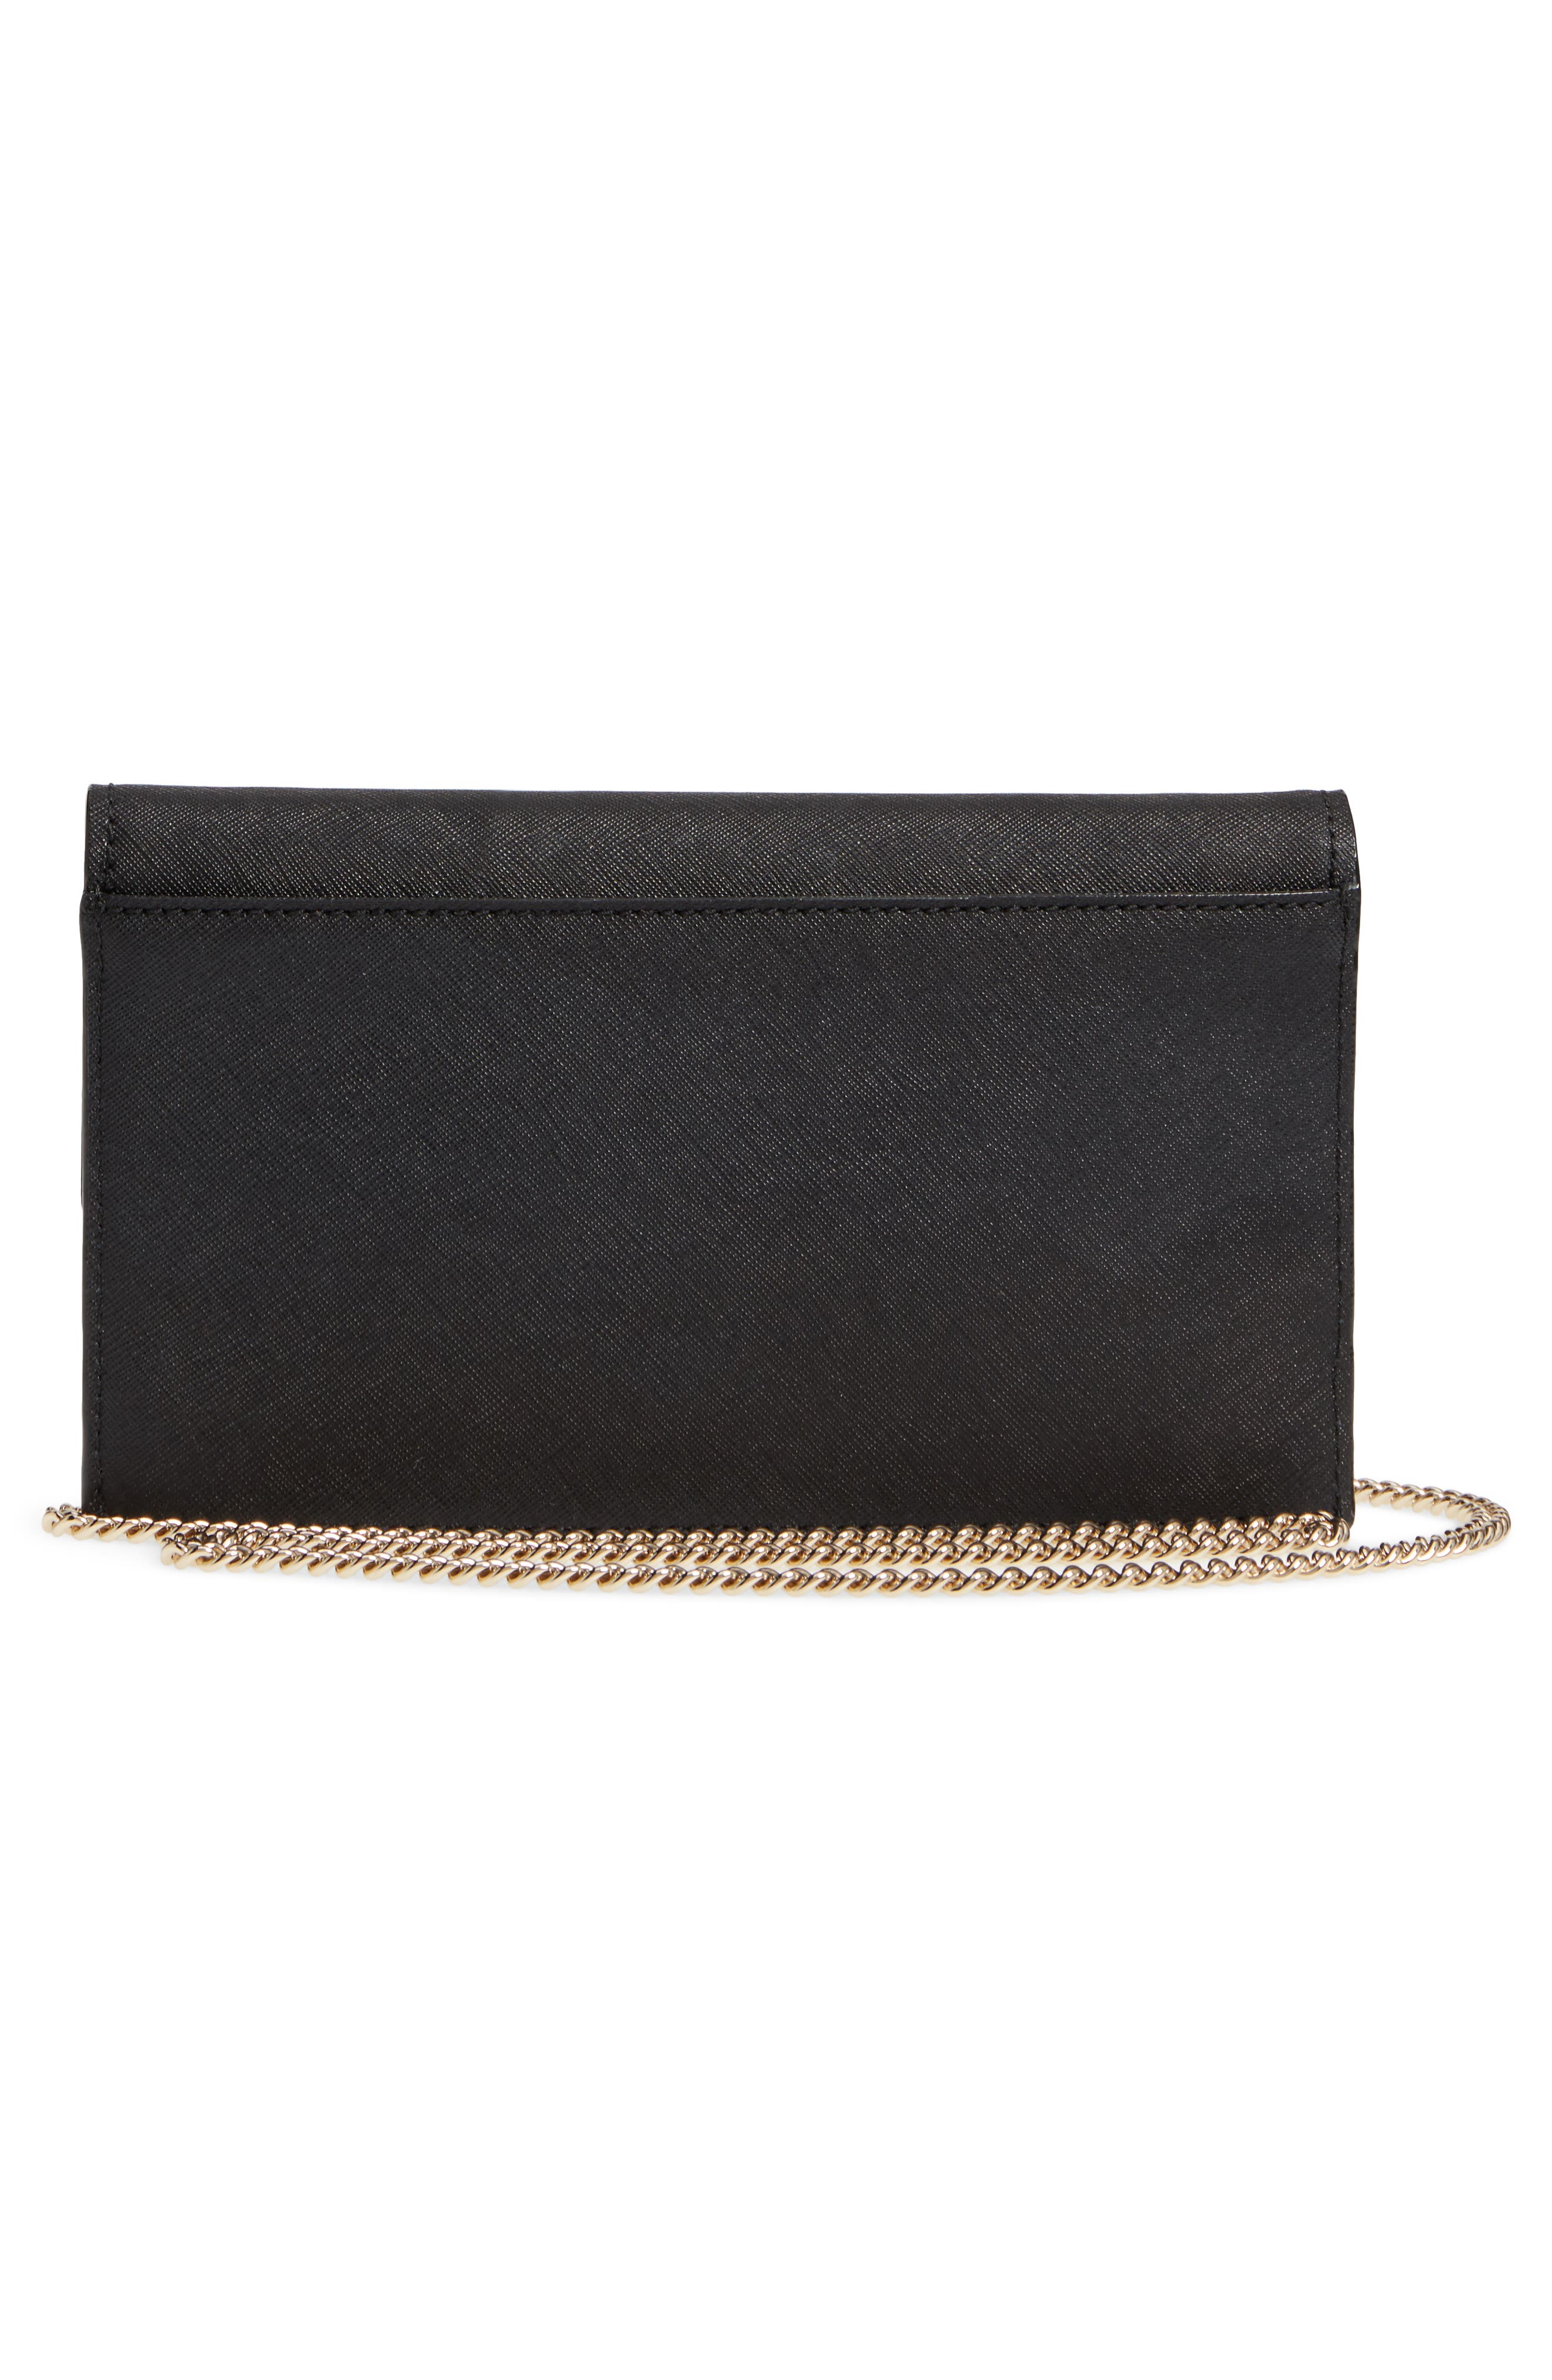 cameron street - brennan leather wallet & card case,                             Alternate thumbnail 3, color,                             001